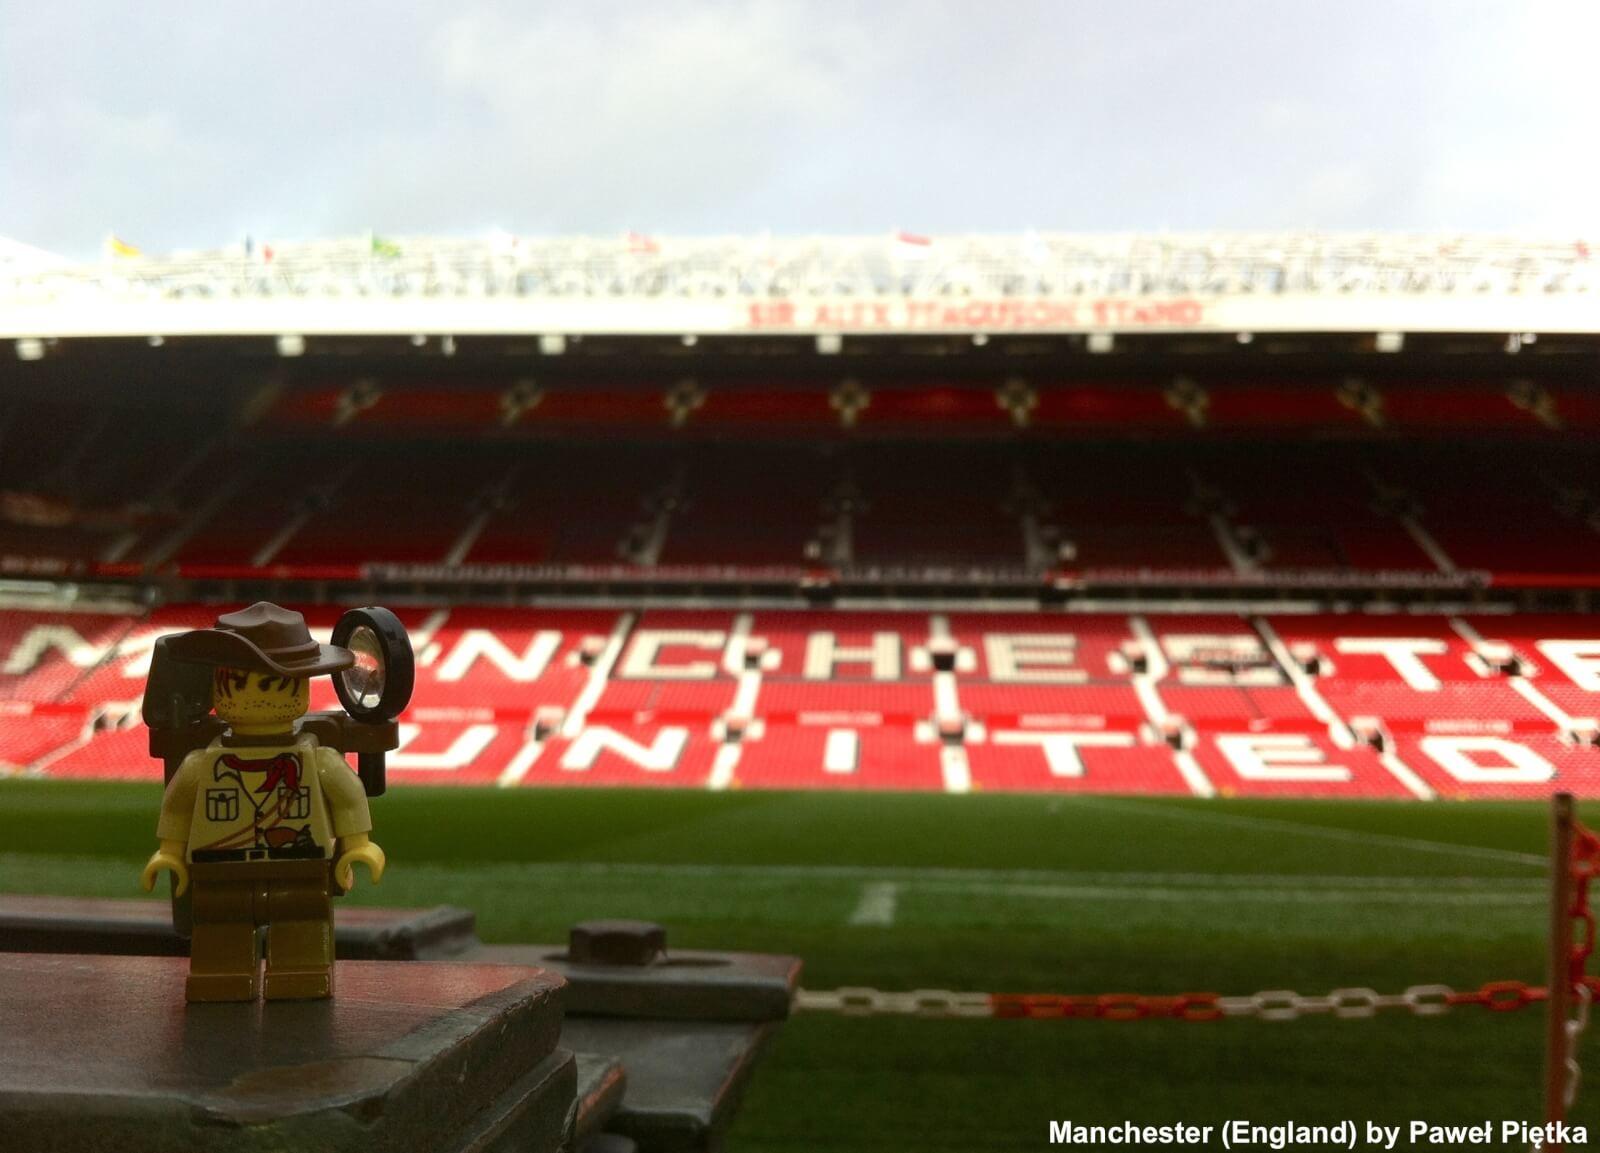 Manchester (England) - Old Trafford Inside